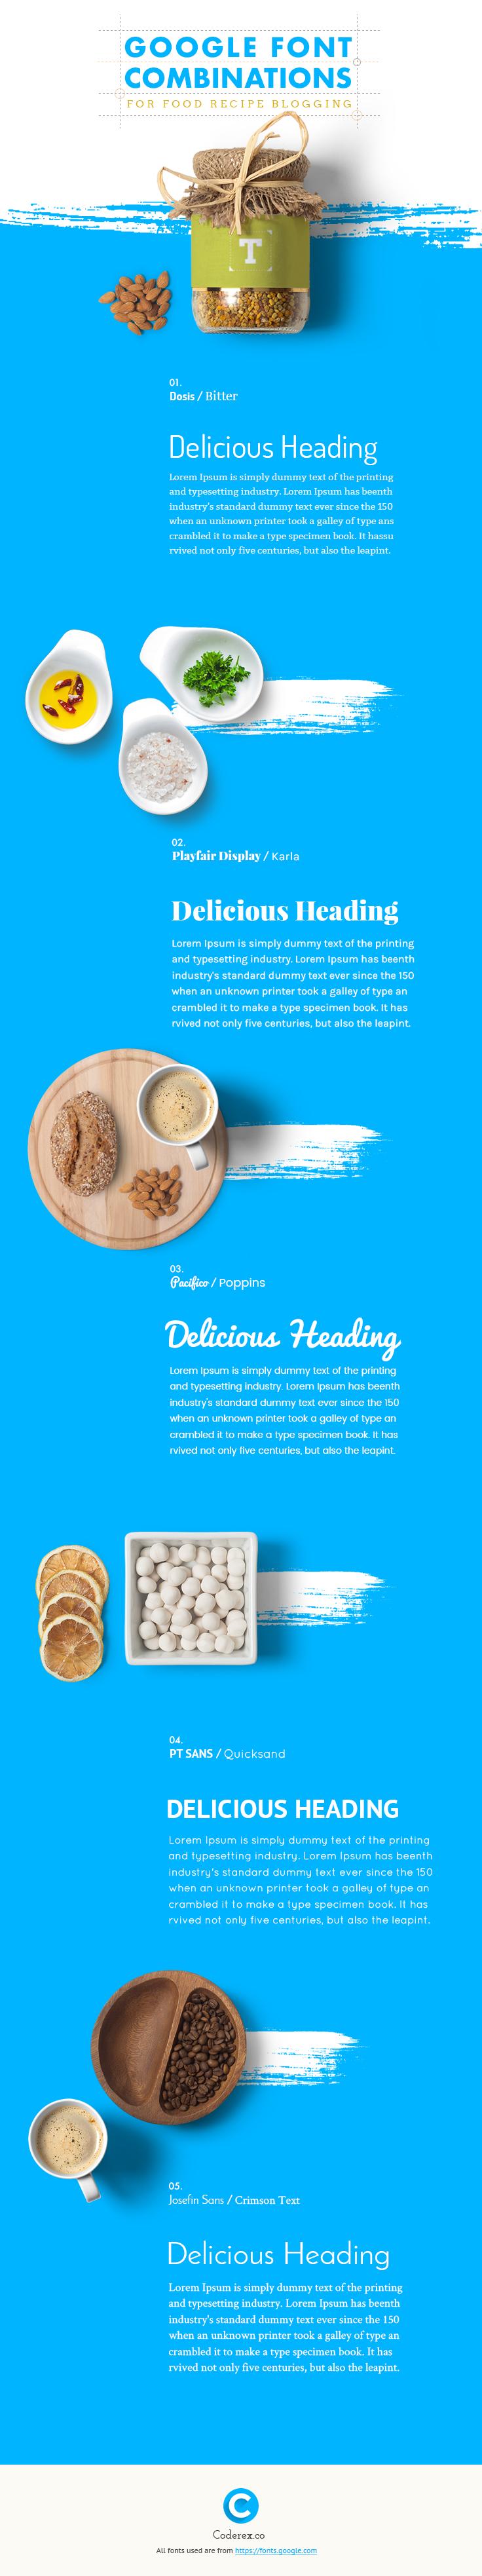 Google Font Combination for Food Recipe Blogging.